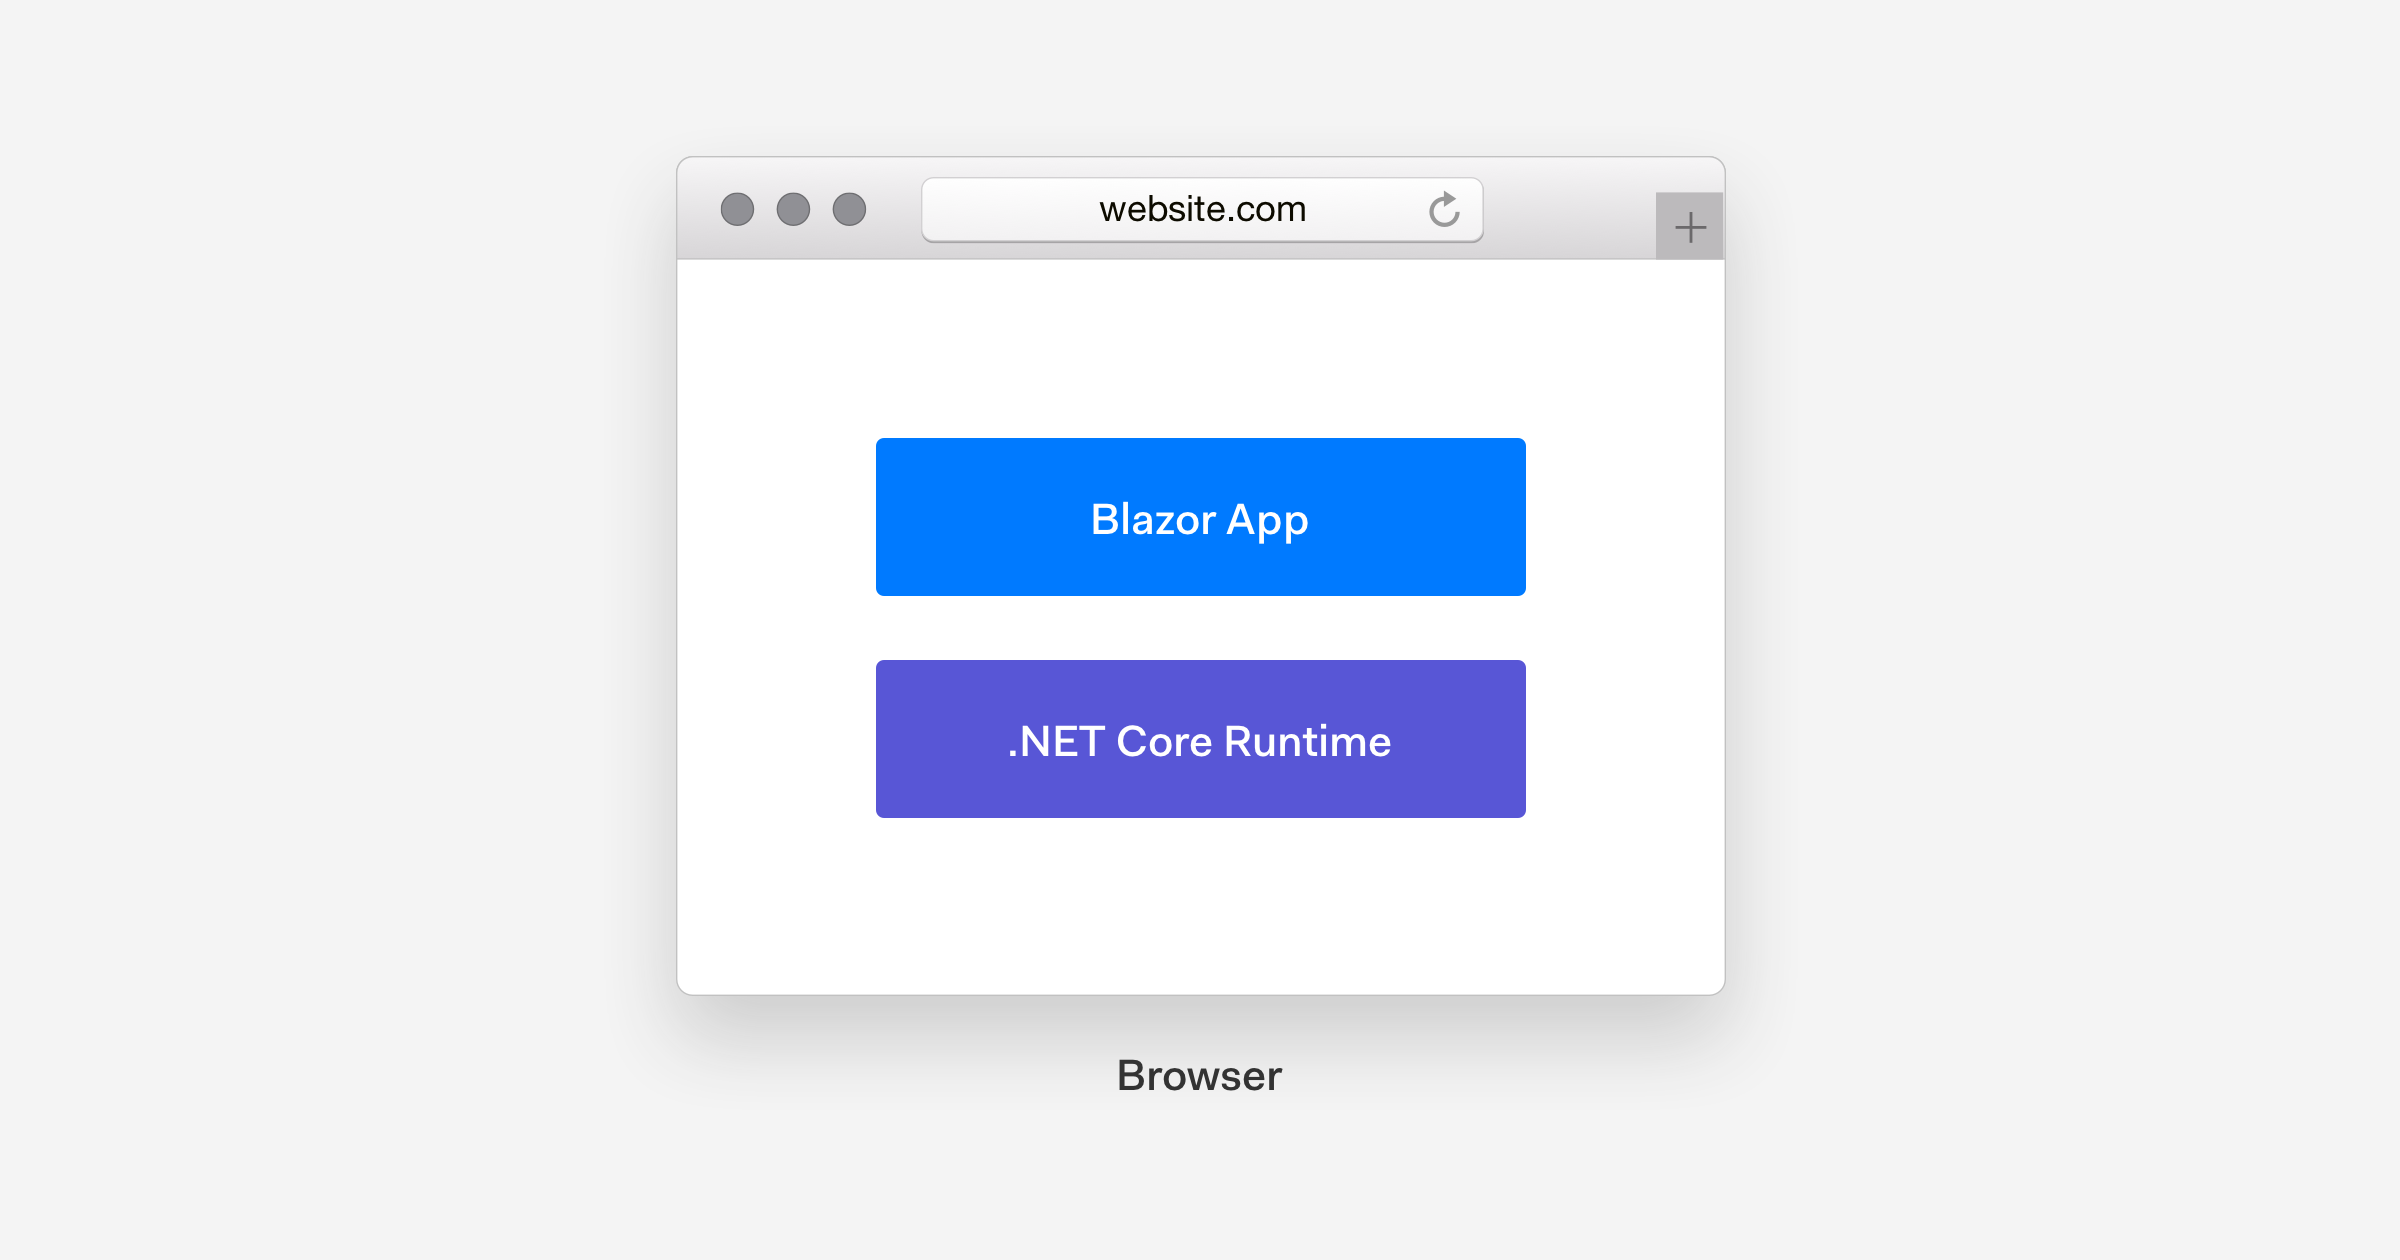 Blazor WebAssembly architecture diagram